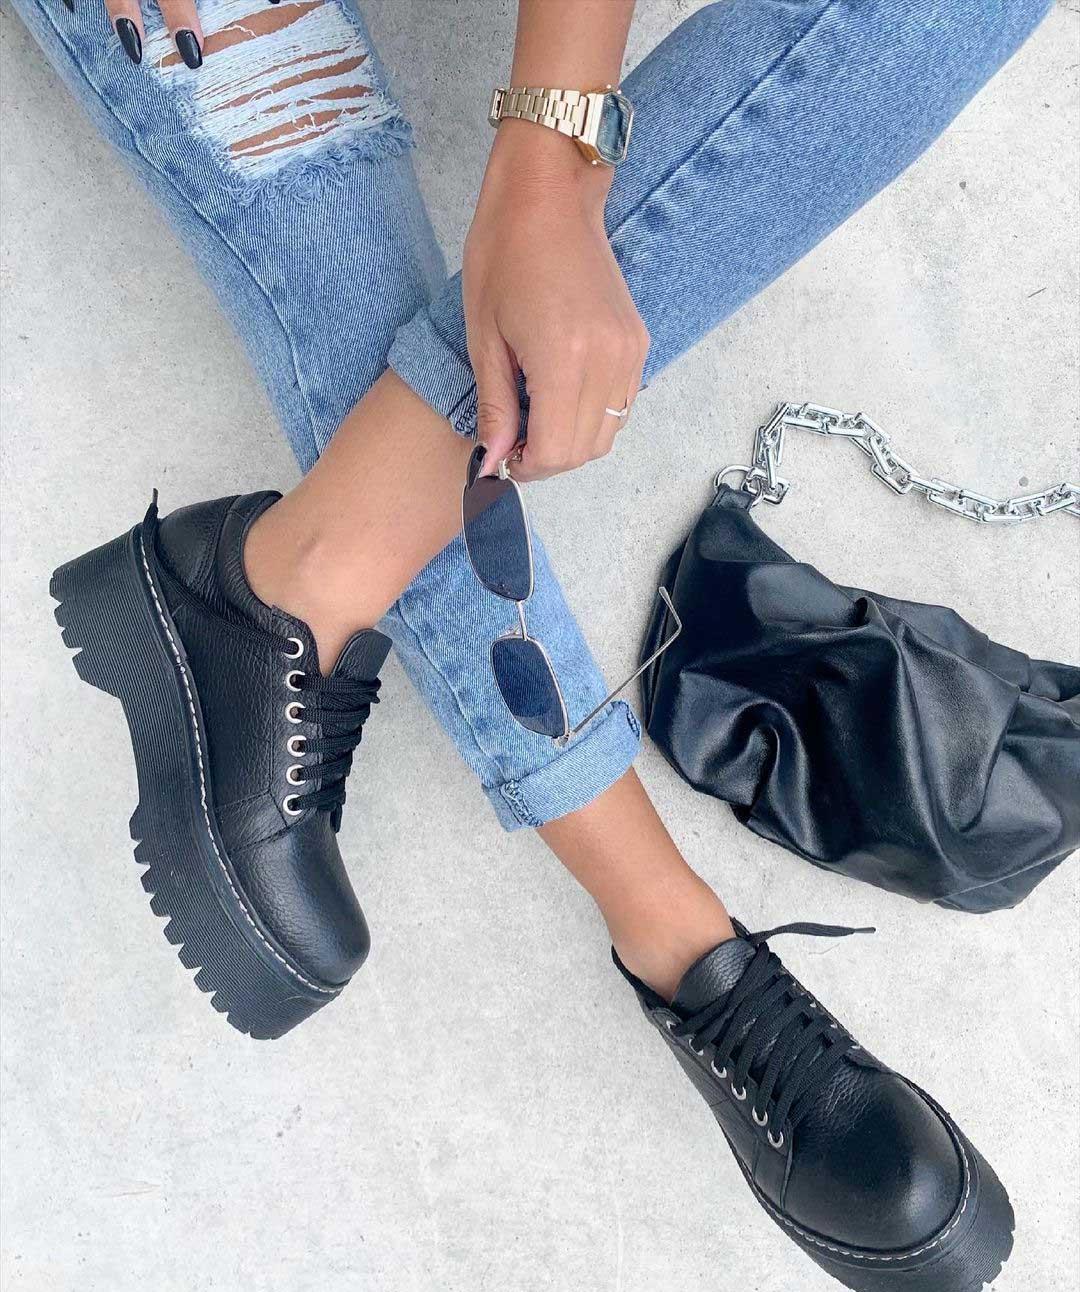 zapatos invierno 2021 moda mujer invierno 2021